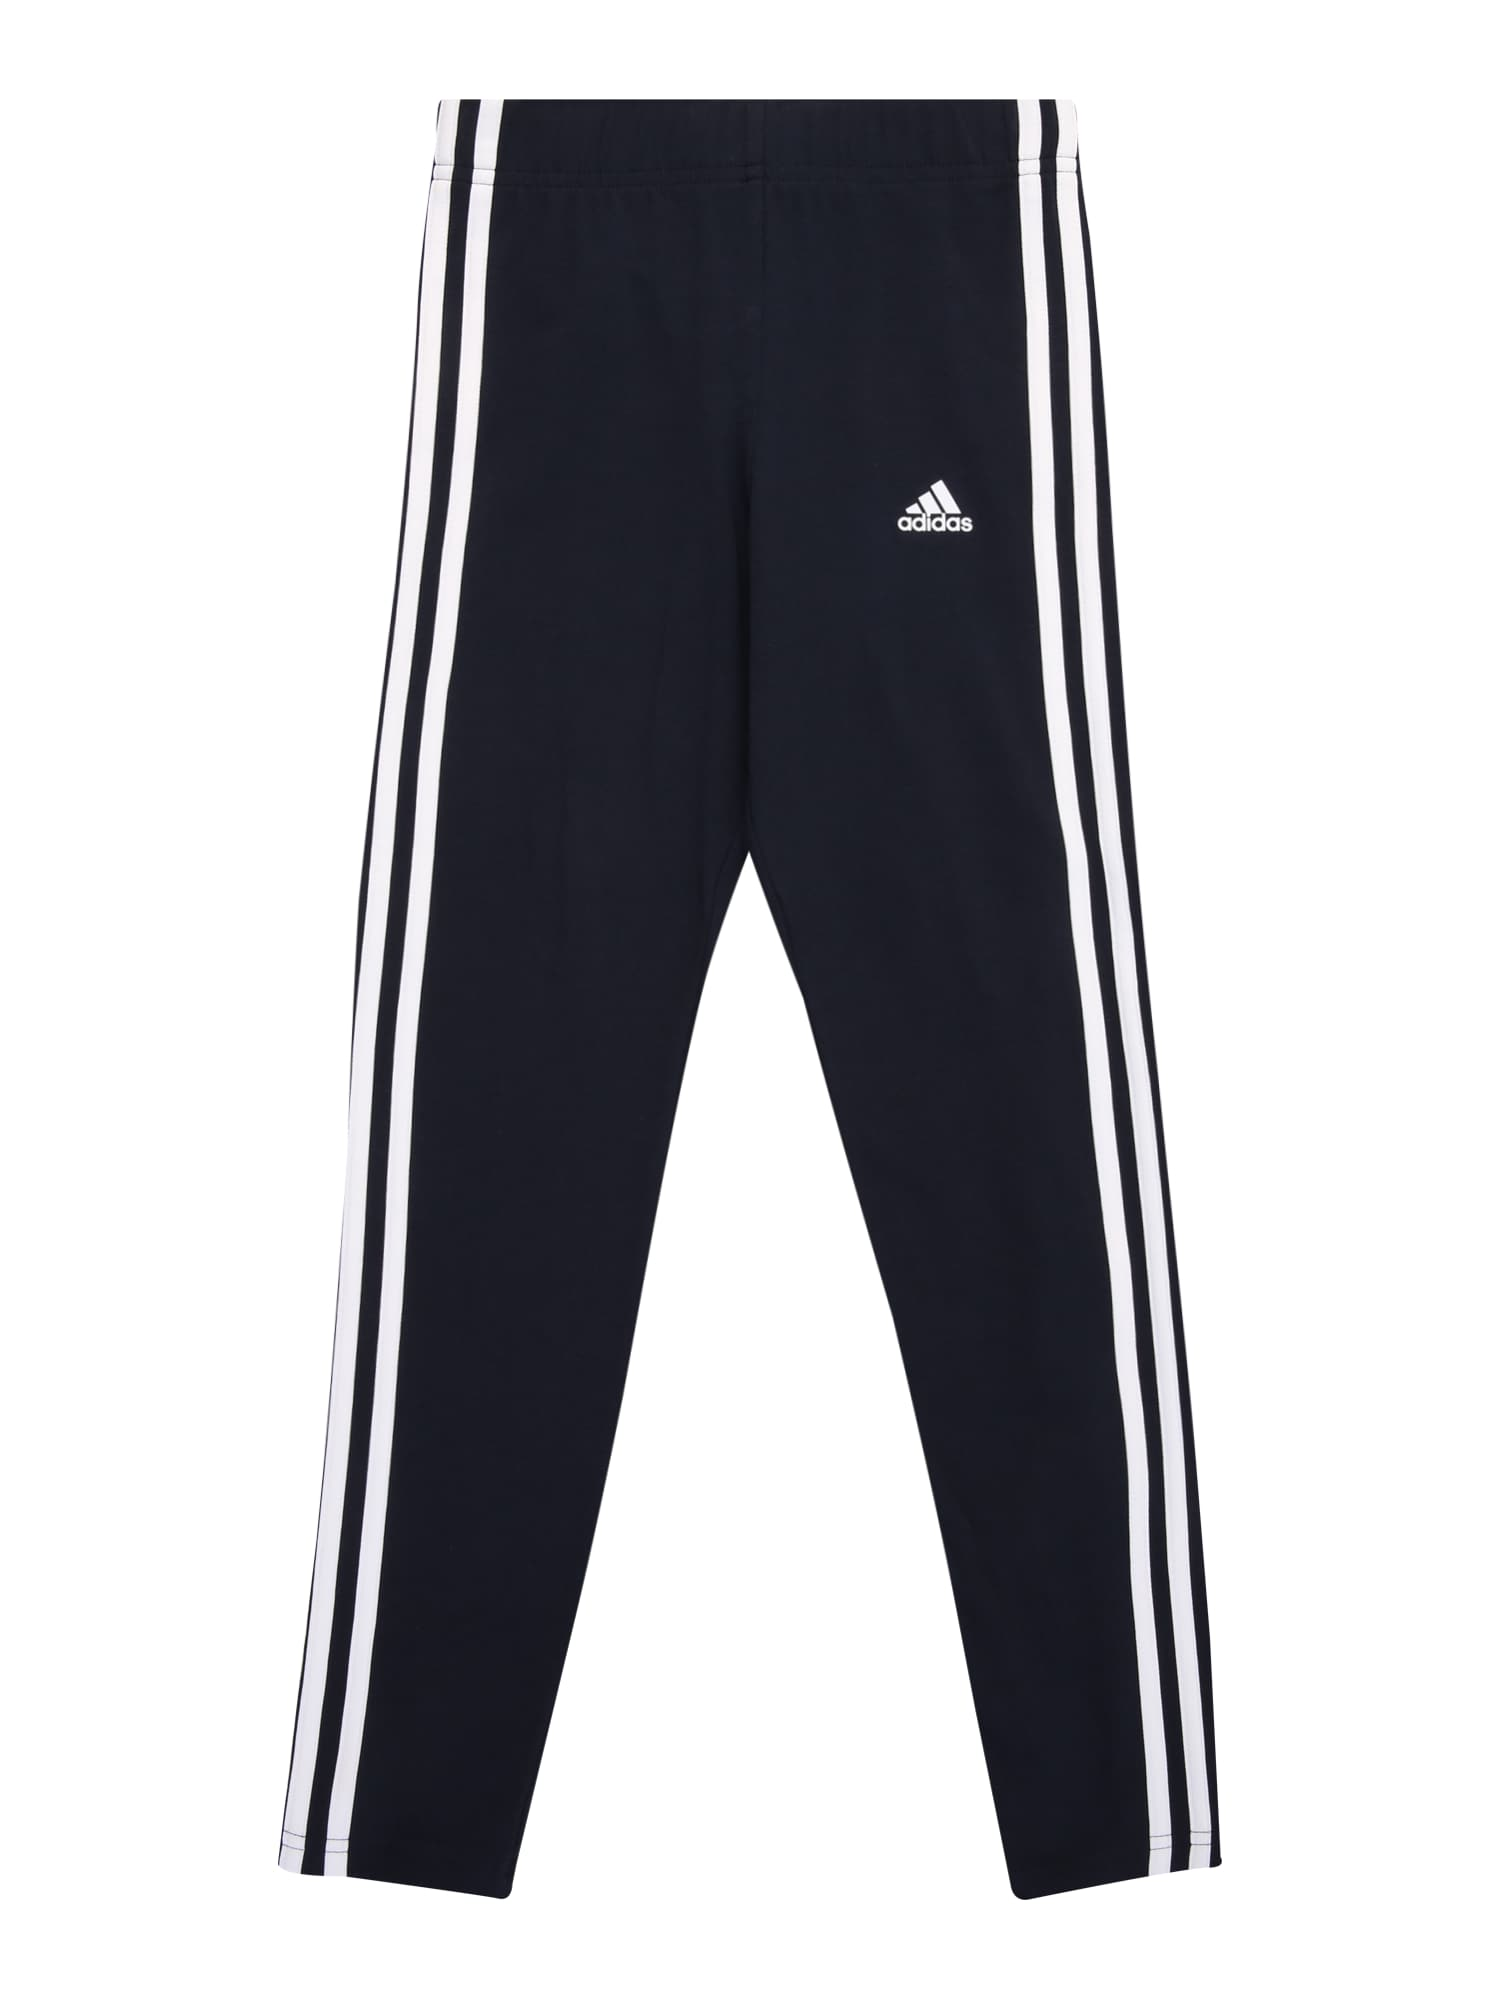 ADIDAS PERFORMANCE Sportinės kelnės 'Essentials' mėlyna / balta